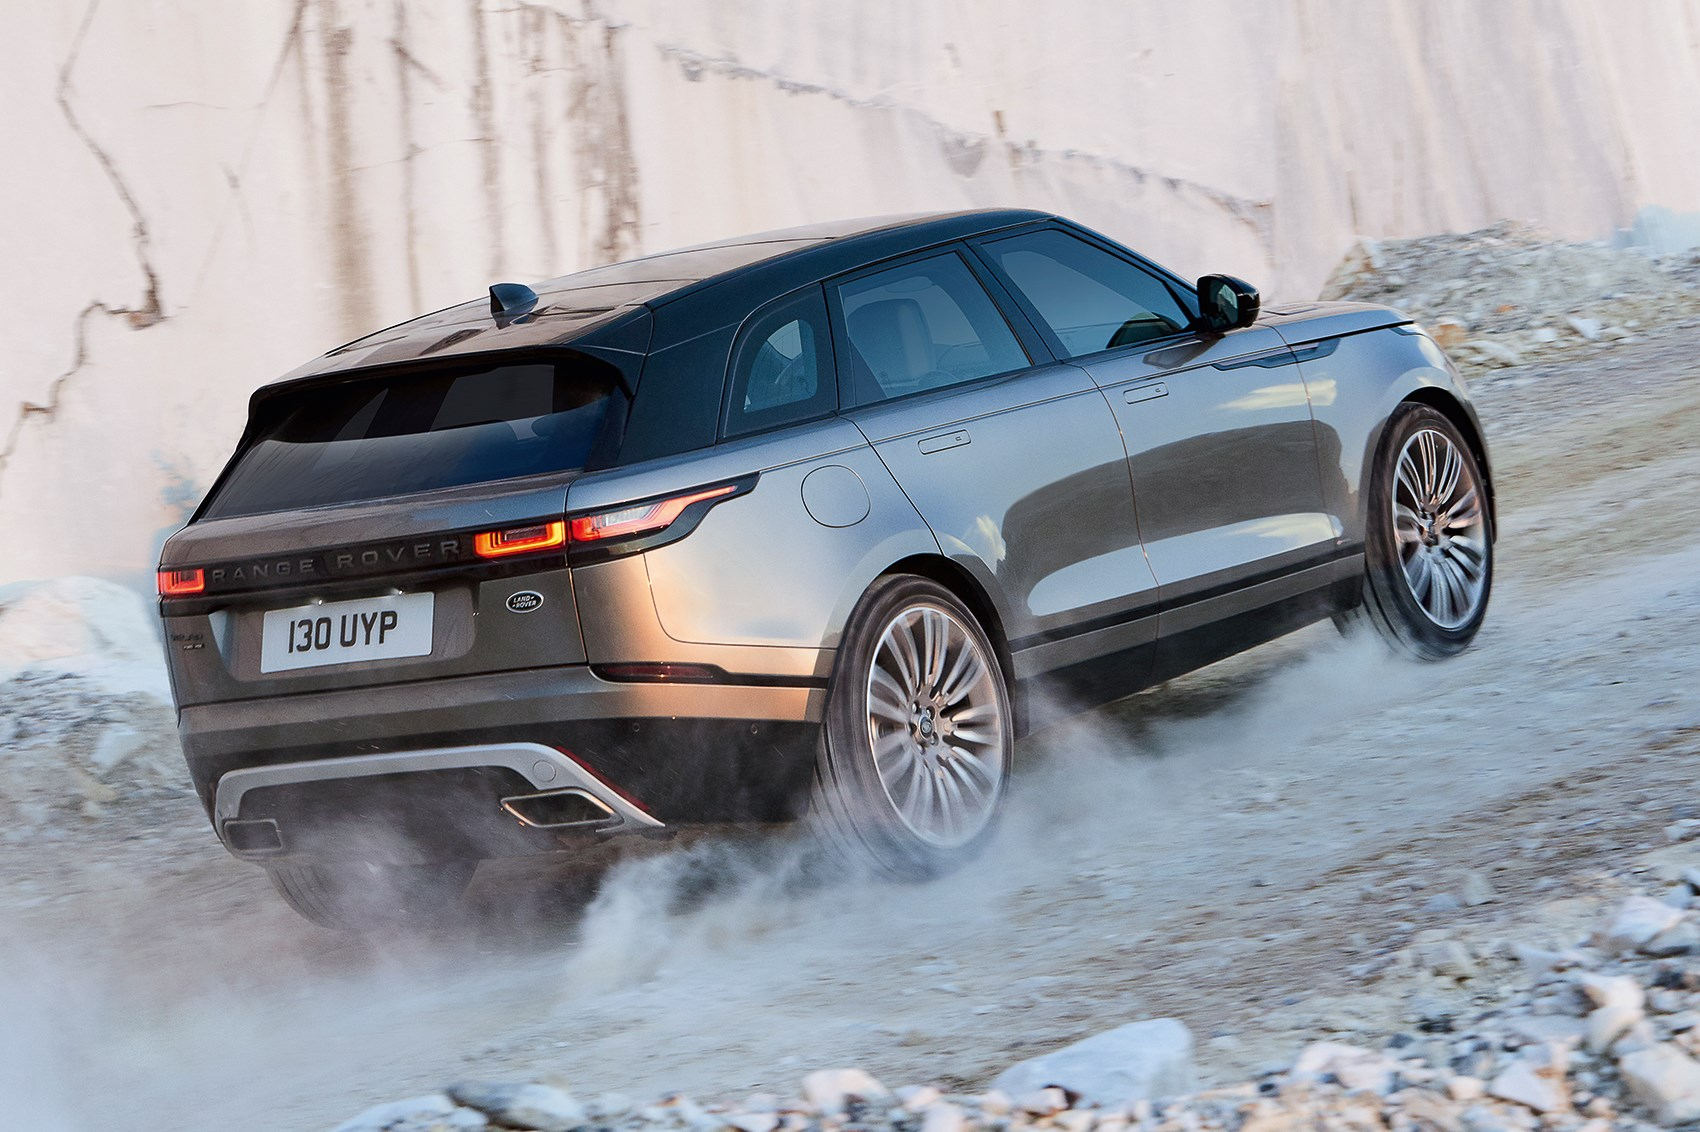 new range rover velar revealed in pictures car magazine. Black Bedroom Furniture Sets. Home Design Ideas